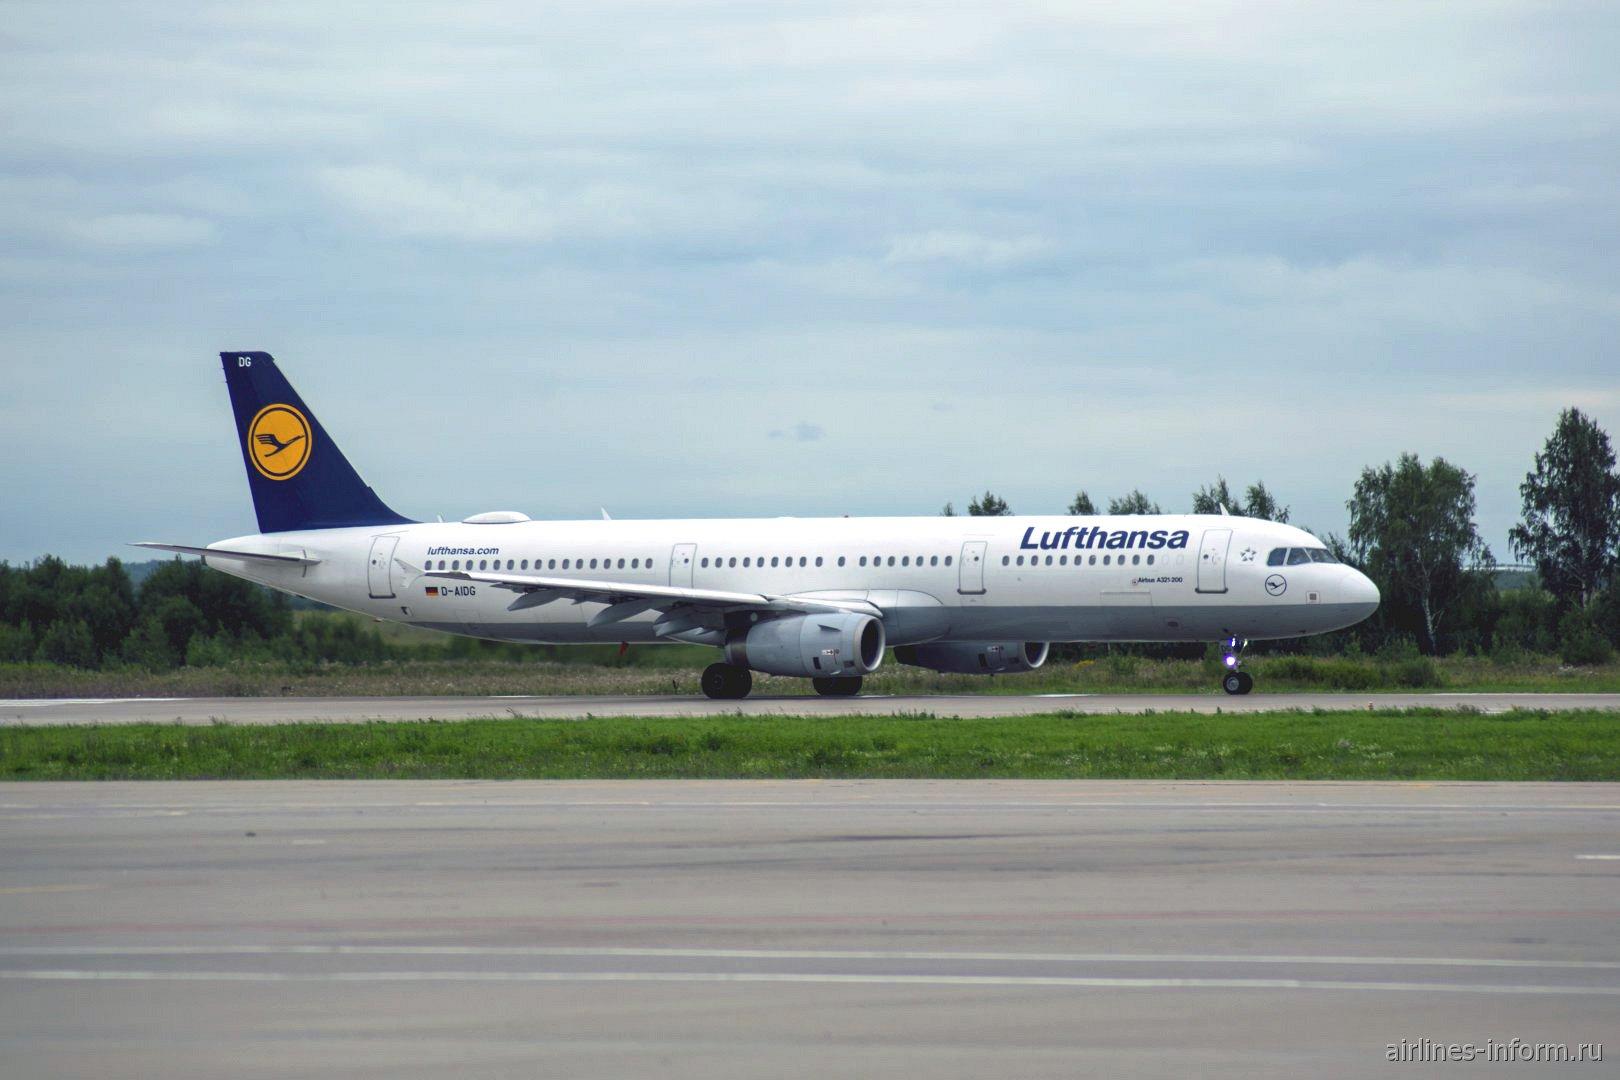 Фото Airbus A321 авиакомпании Lufthansa в аэропорту Домодедово